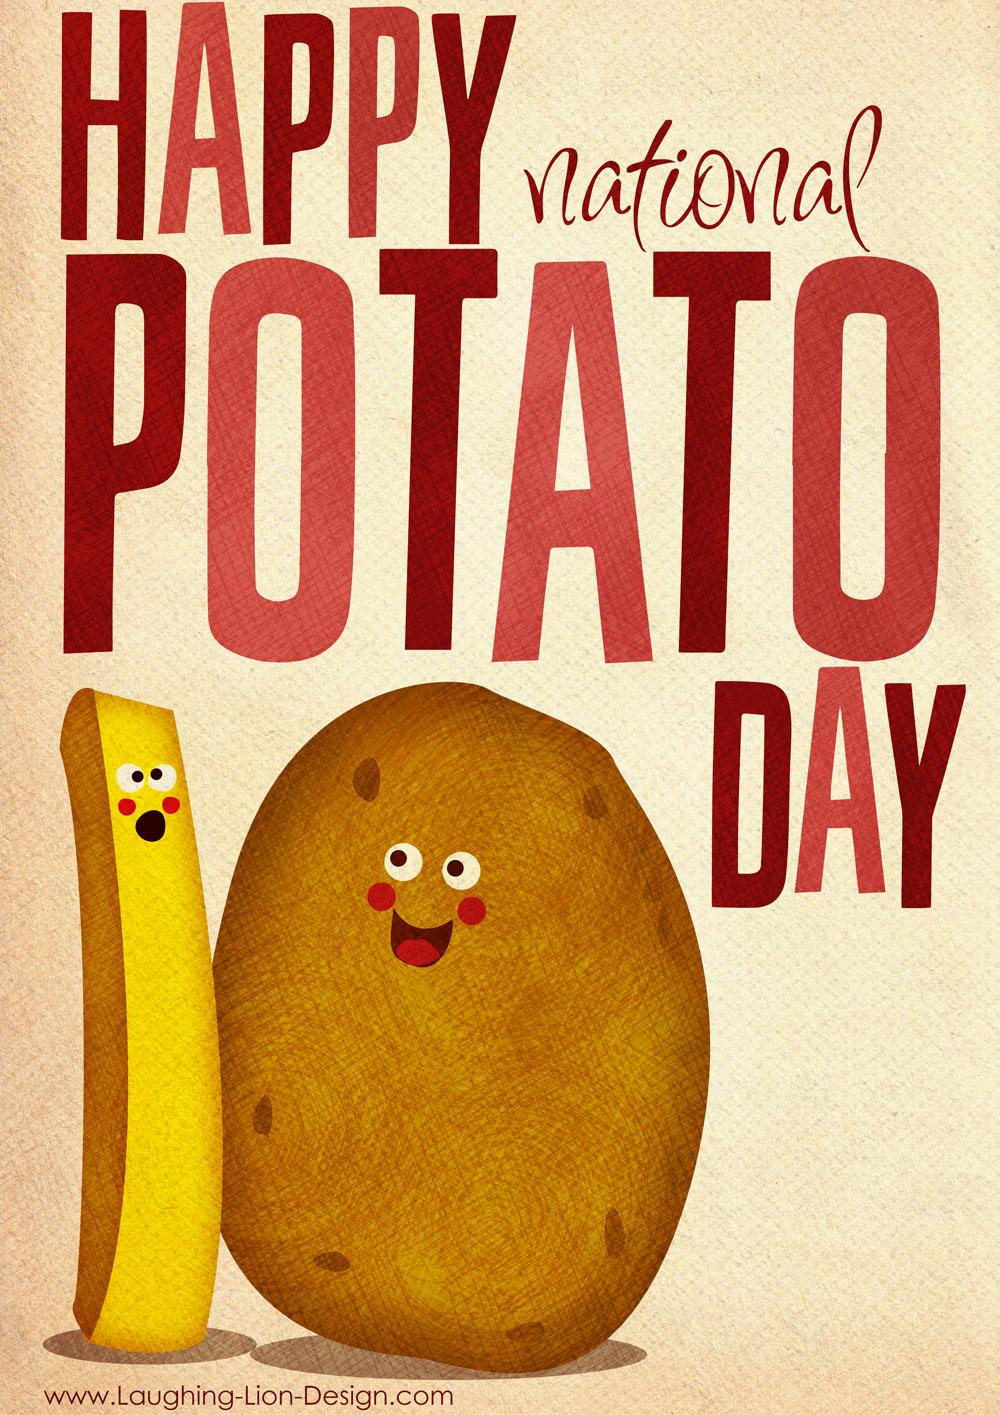 National Potato Day Illustration